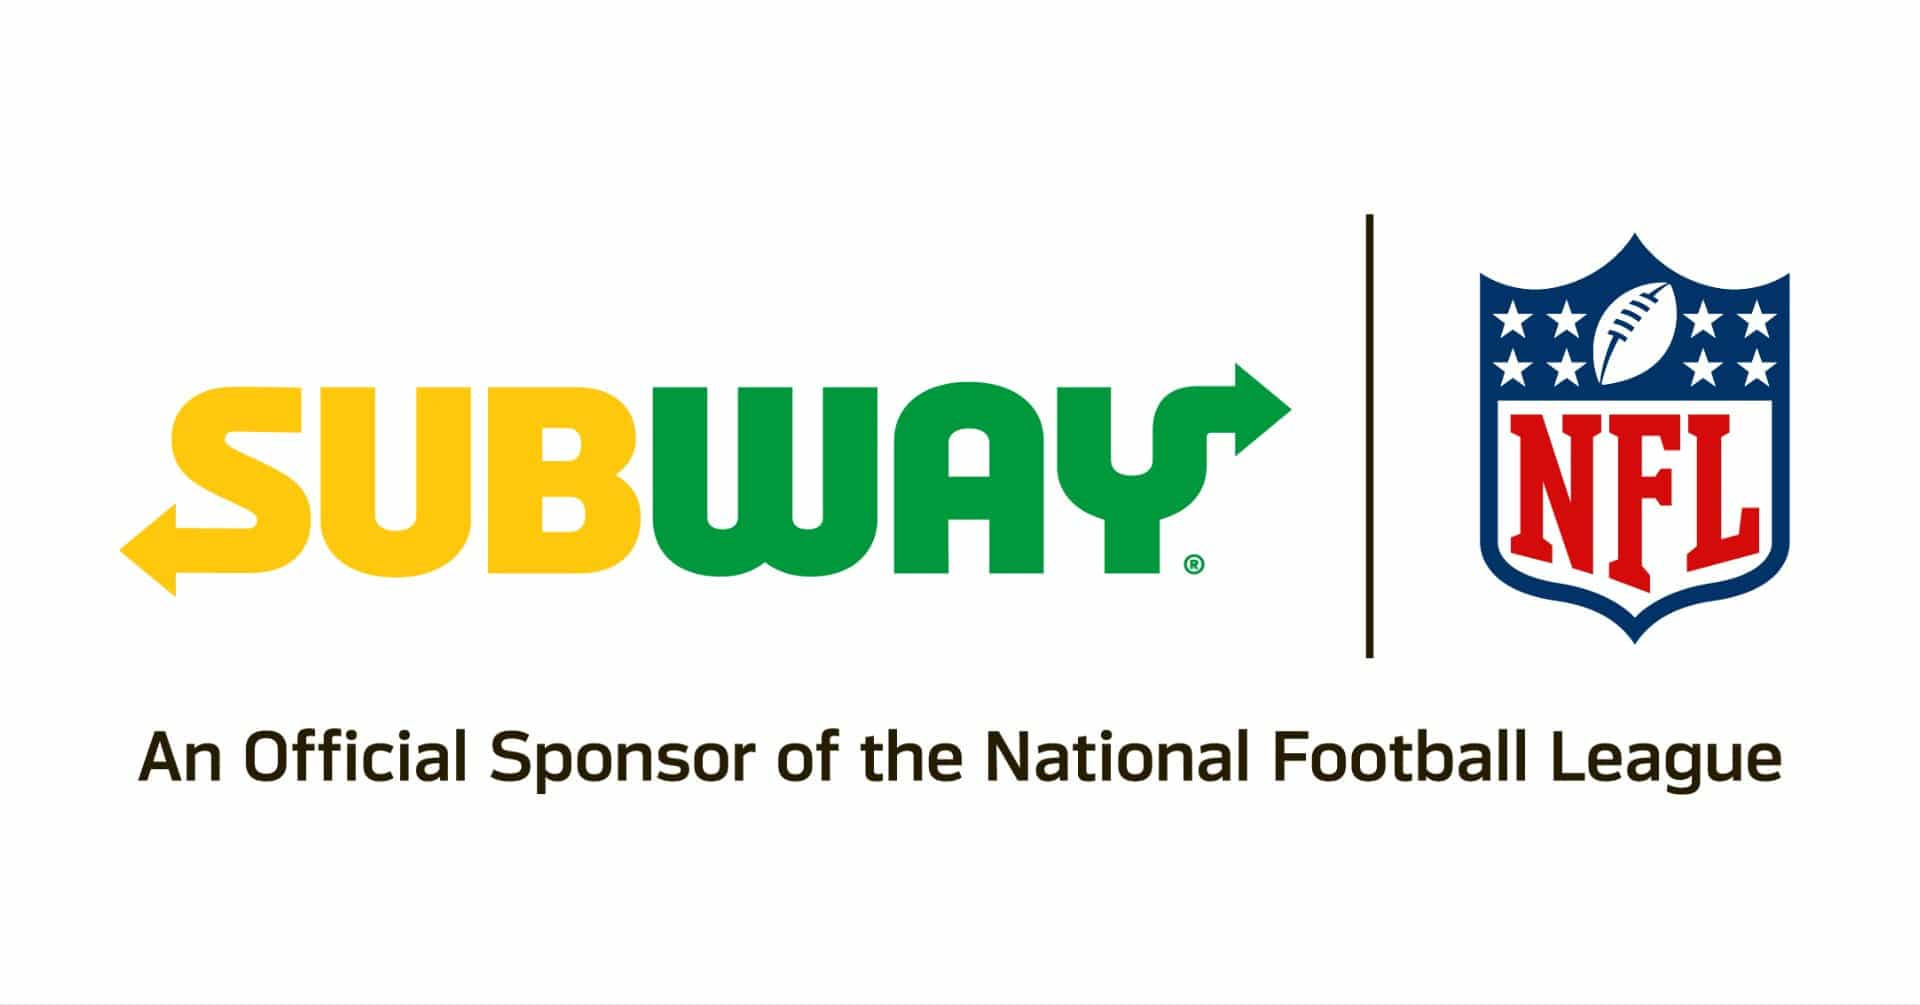 Subway sponsors of NFL